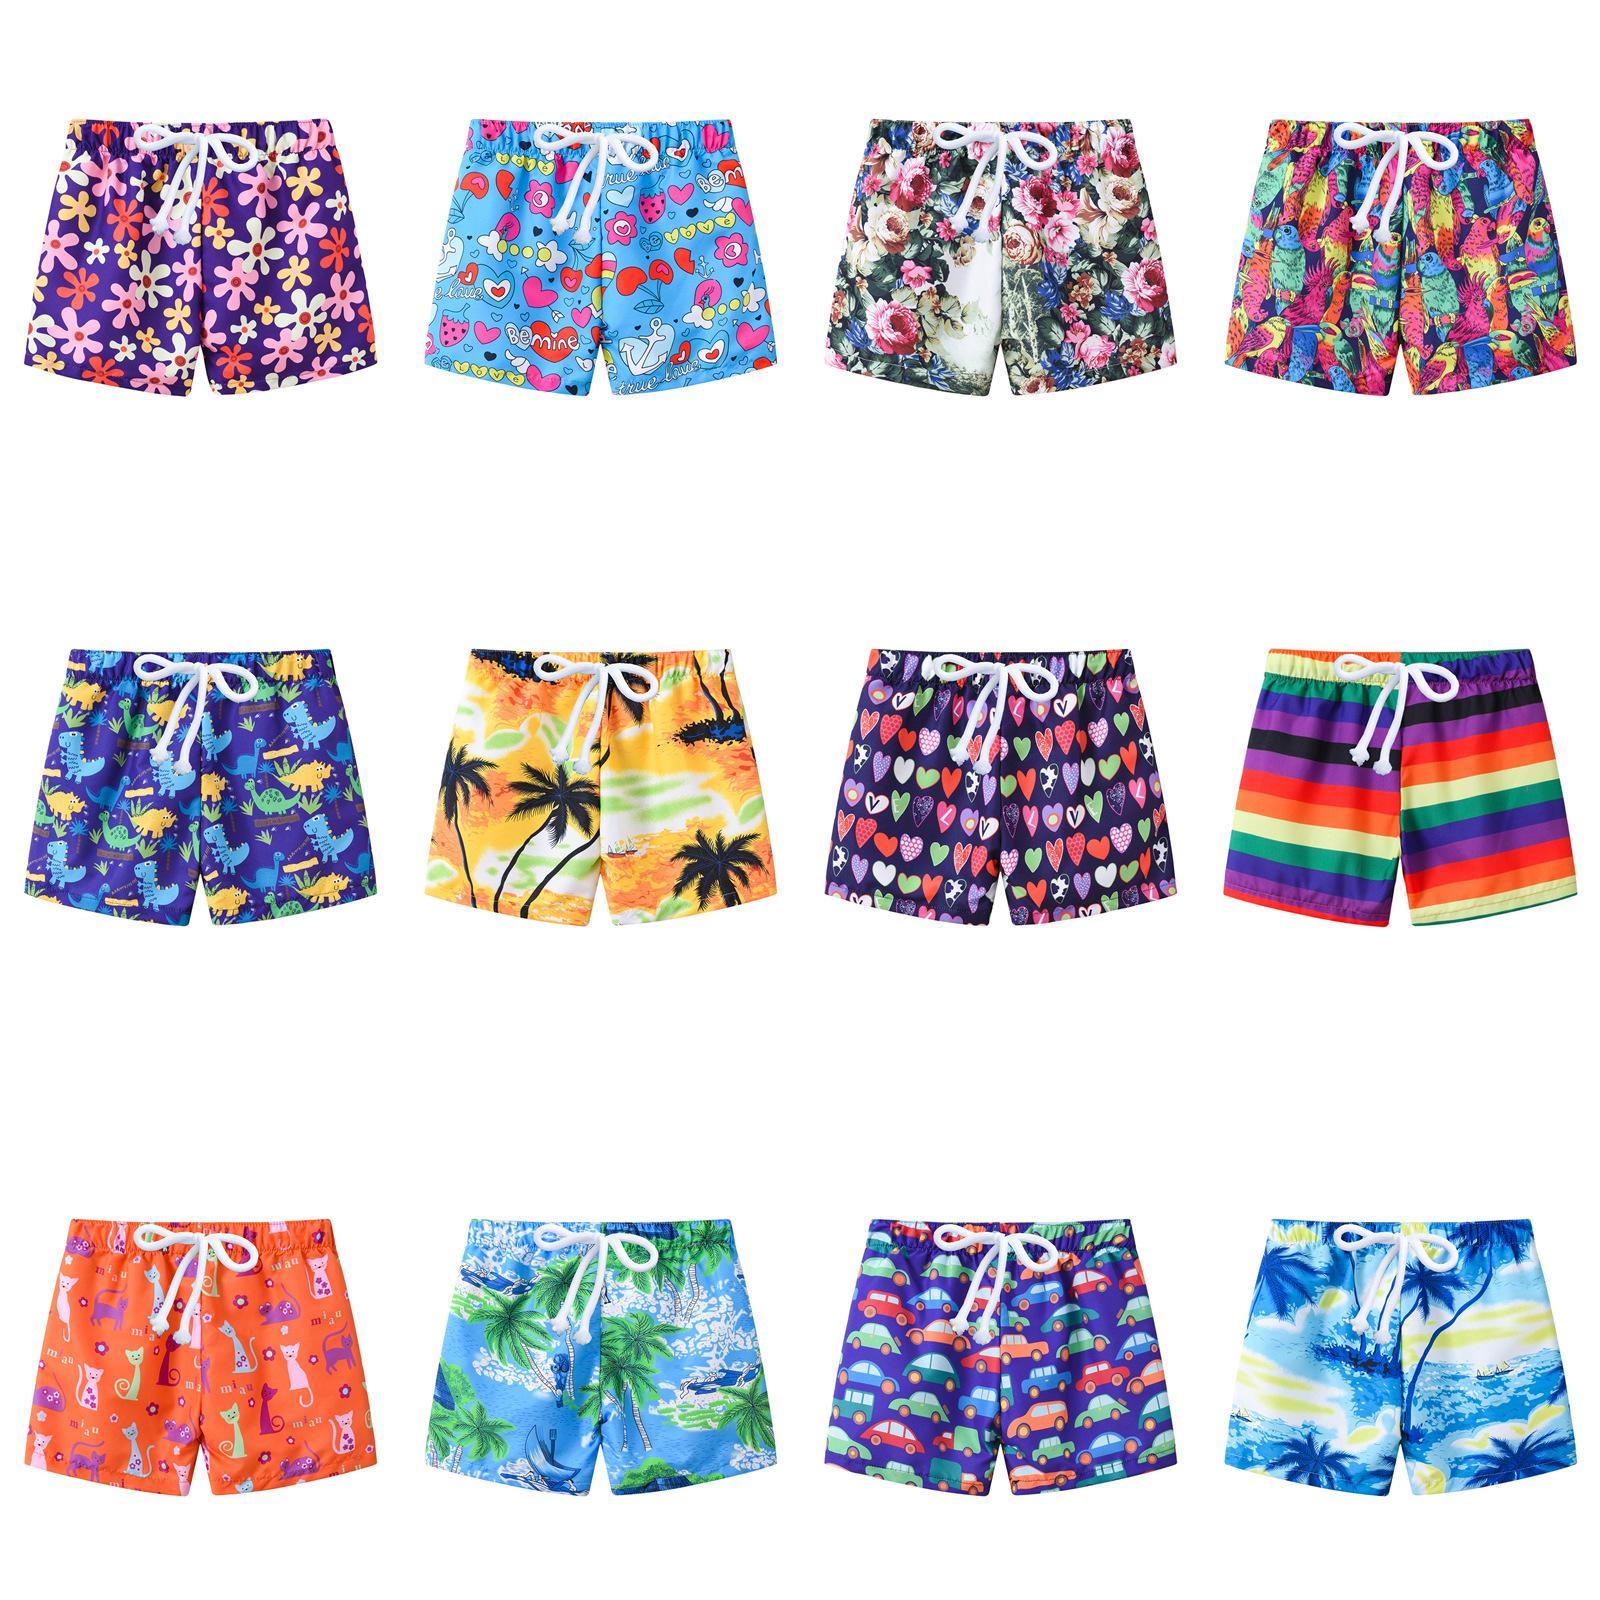 98f5817c525 13styles Children Summer Print Shorts Kids Baby Girl Cartoon Striped Car  Pattern Beach Pants Children Adjusting Belt Shorts WWA219 Shorts For  Teenage Guys ...